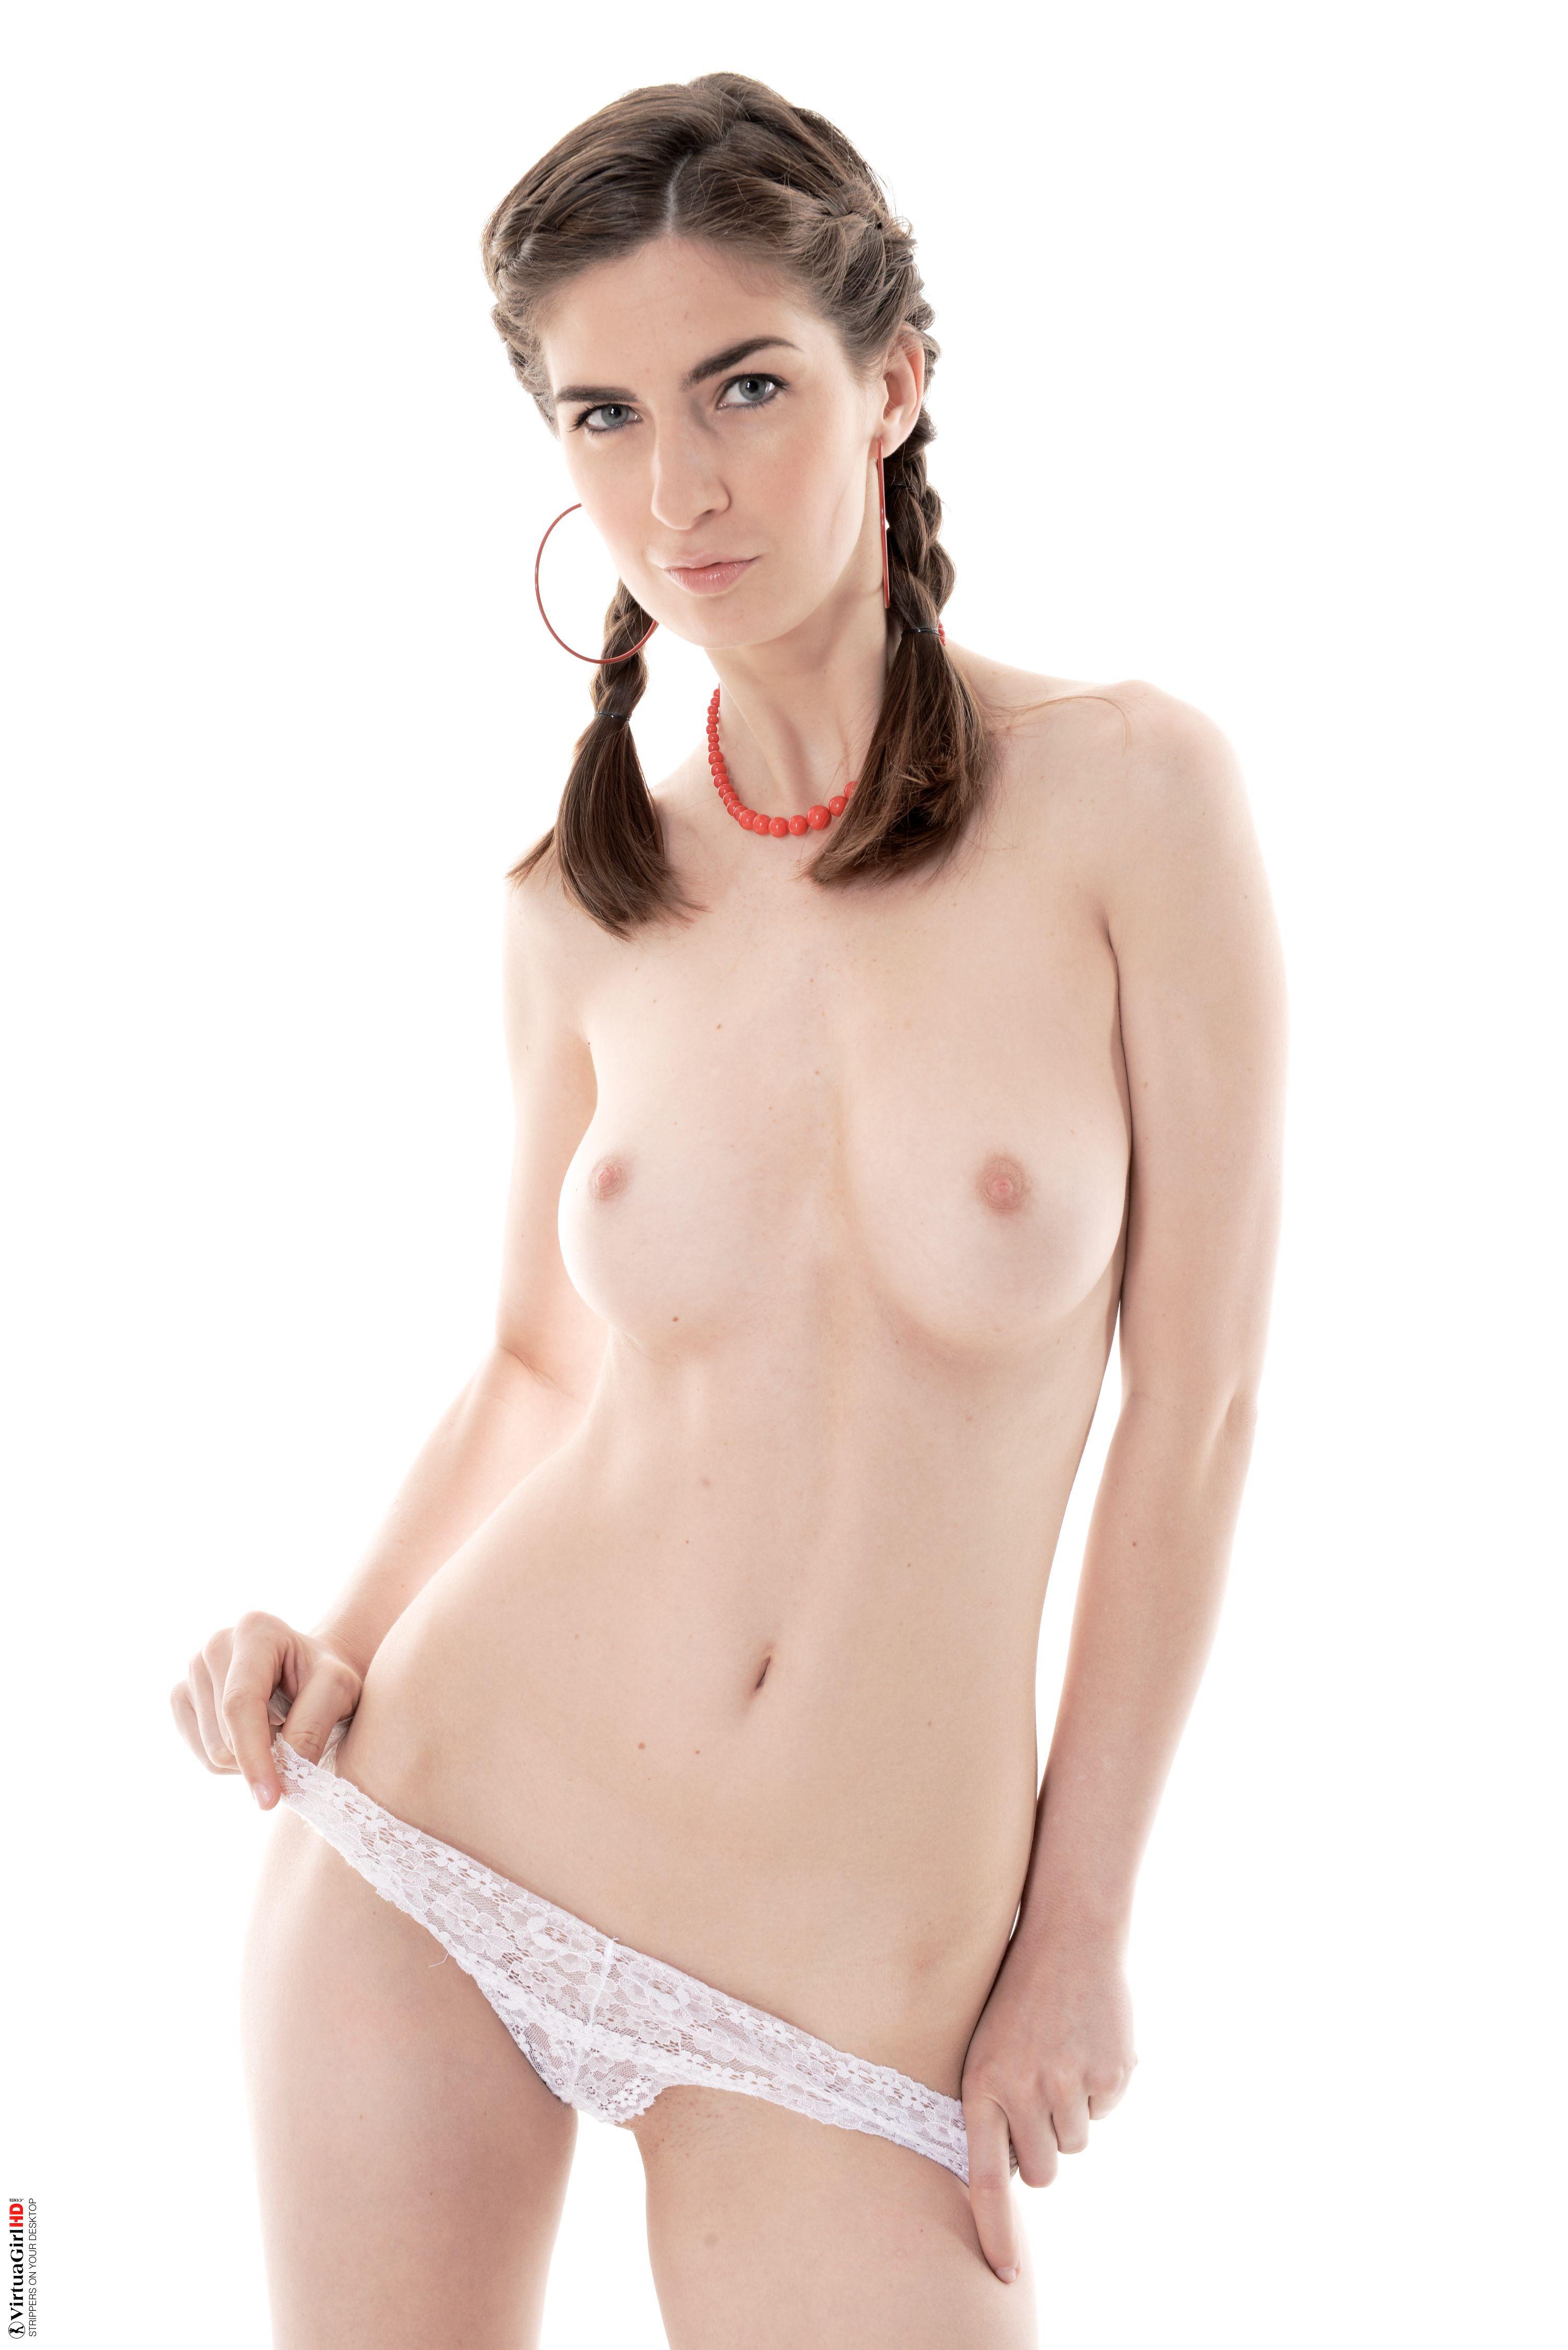 Actor Porno Gay Mudo virtuagirl charlotta southern girl 147458 - good sex porn